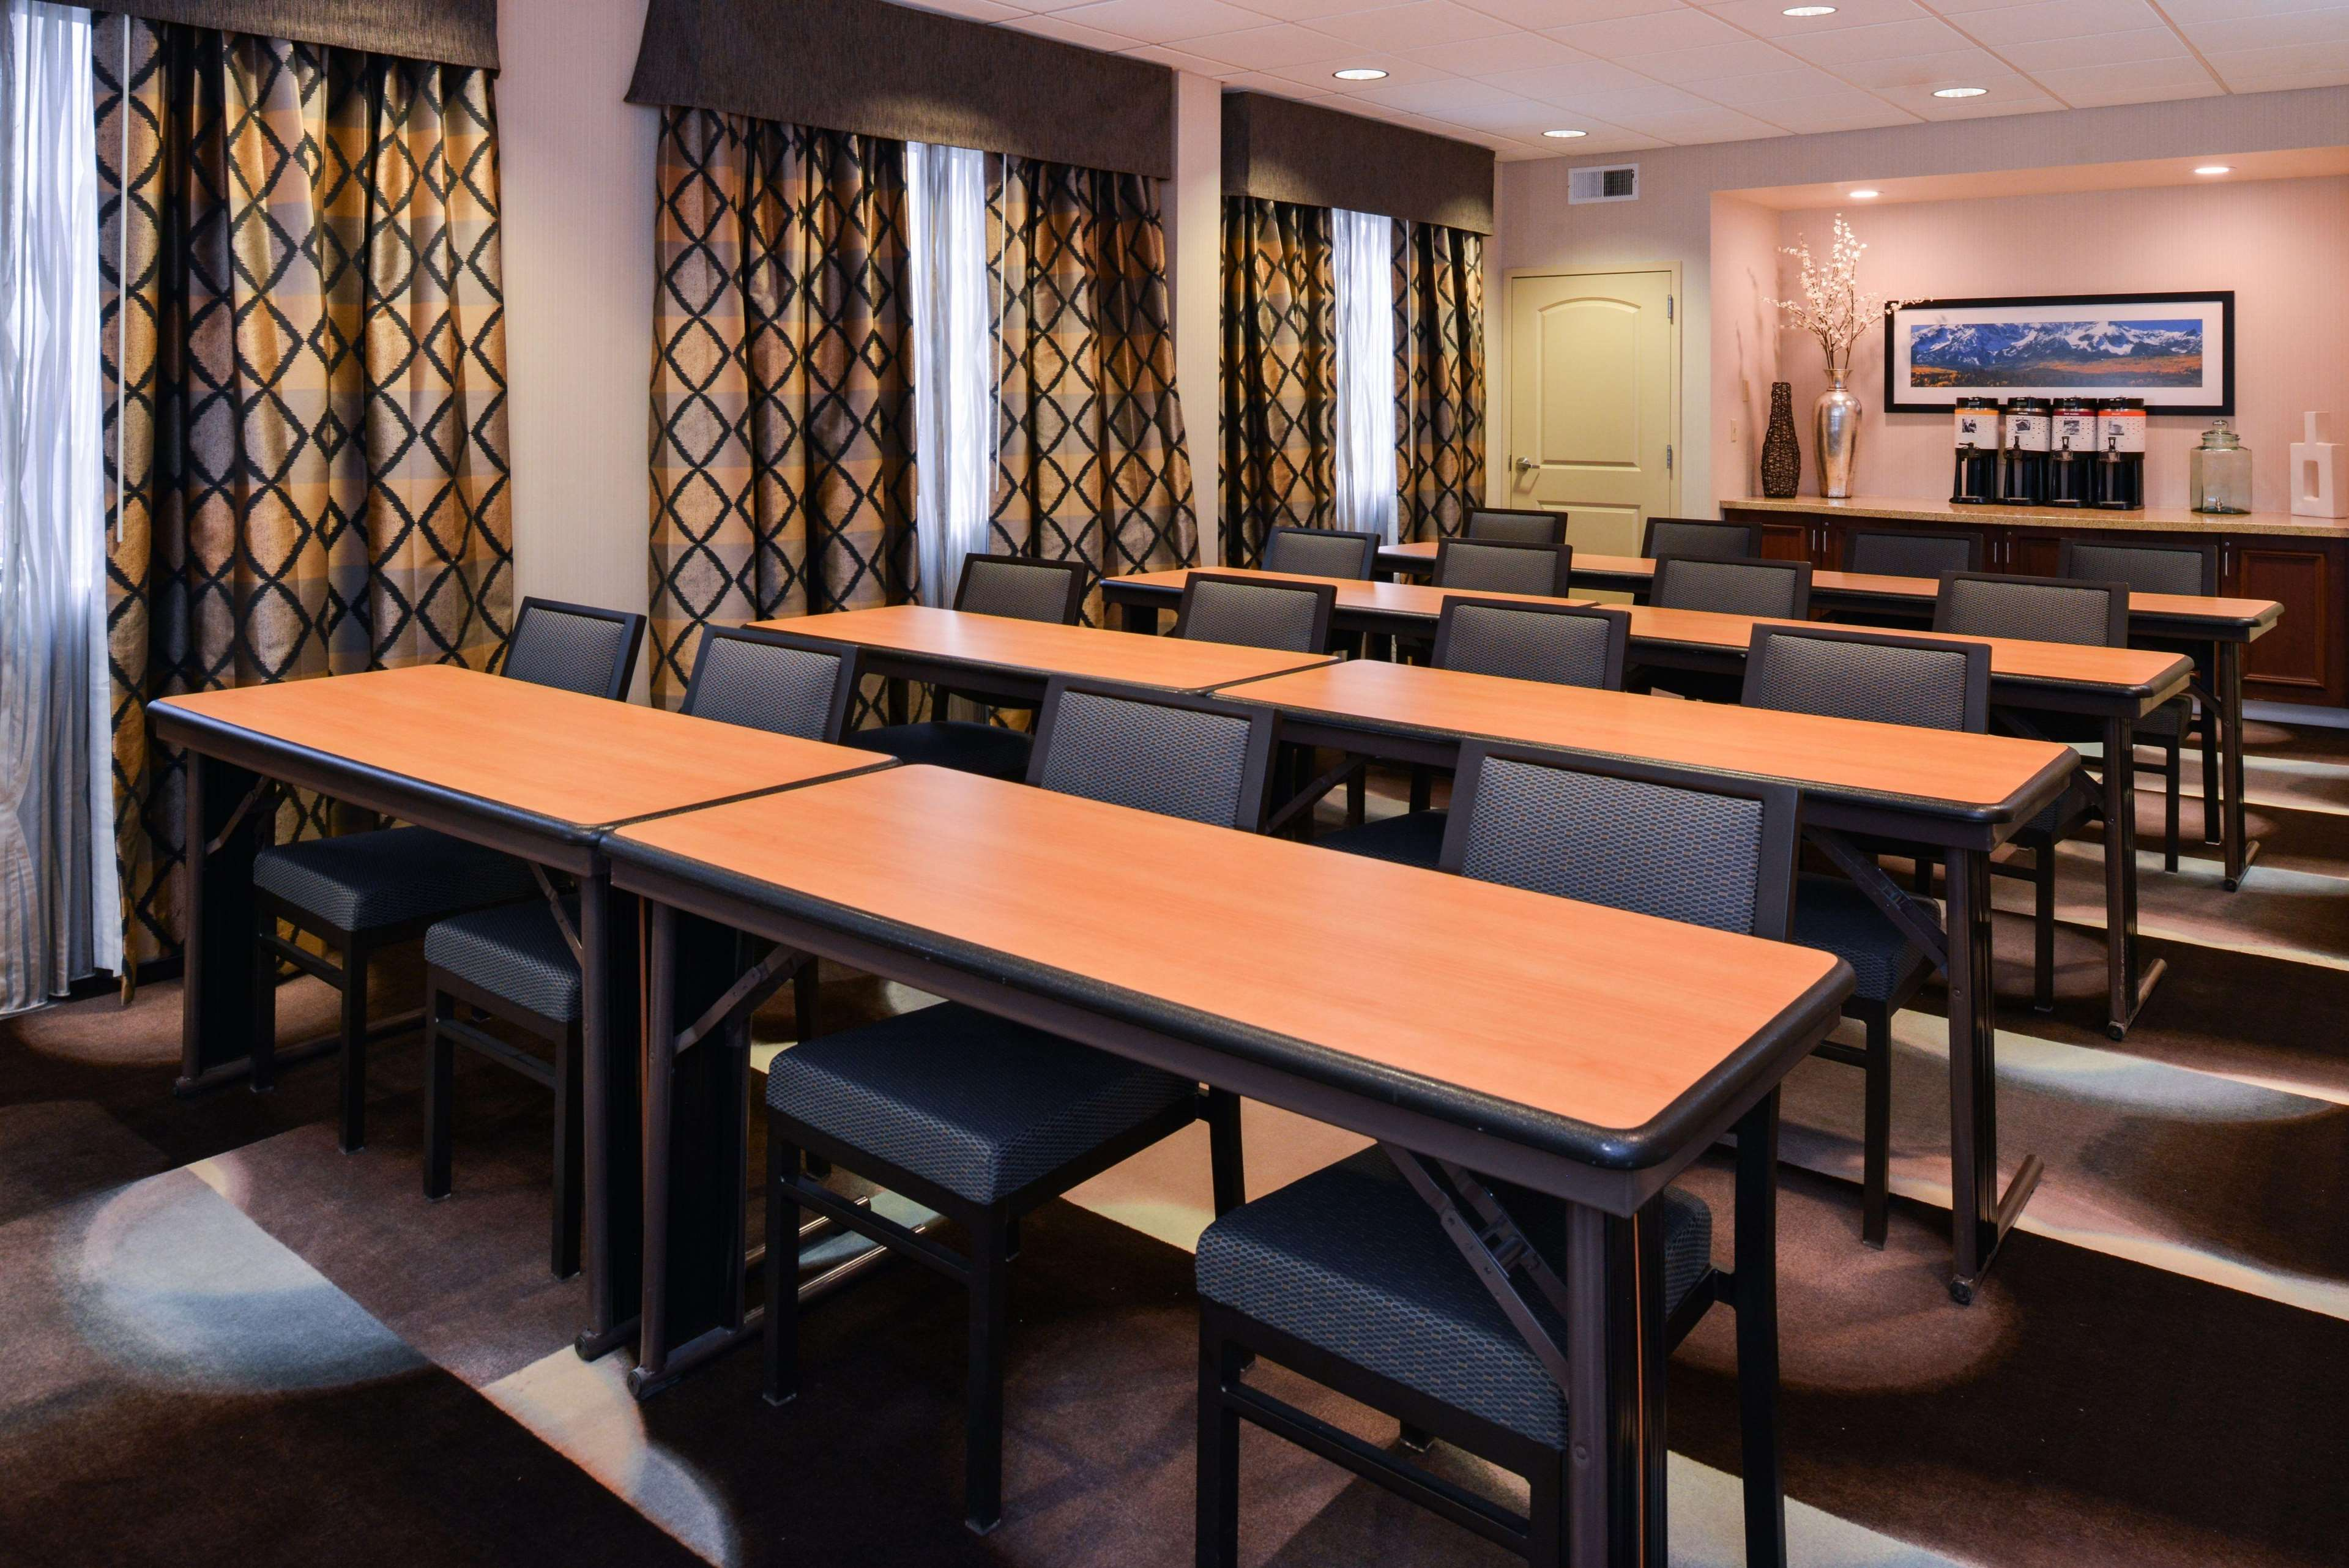 Hampton Inn & Suites Denver-Speer Boulevard image 36